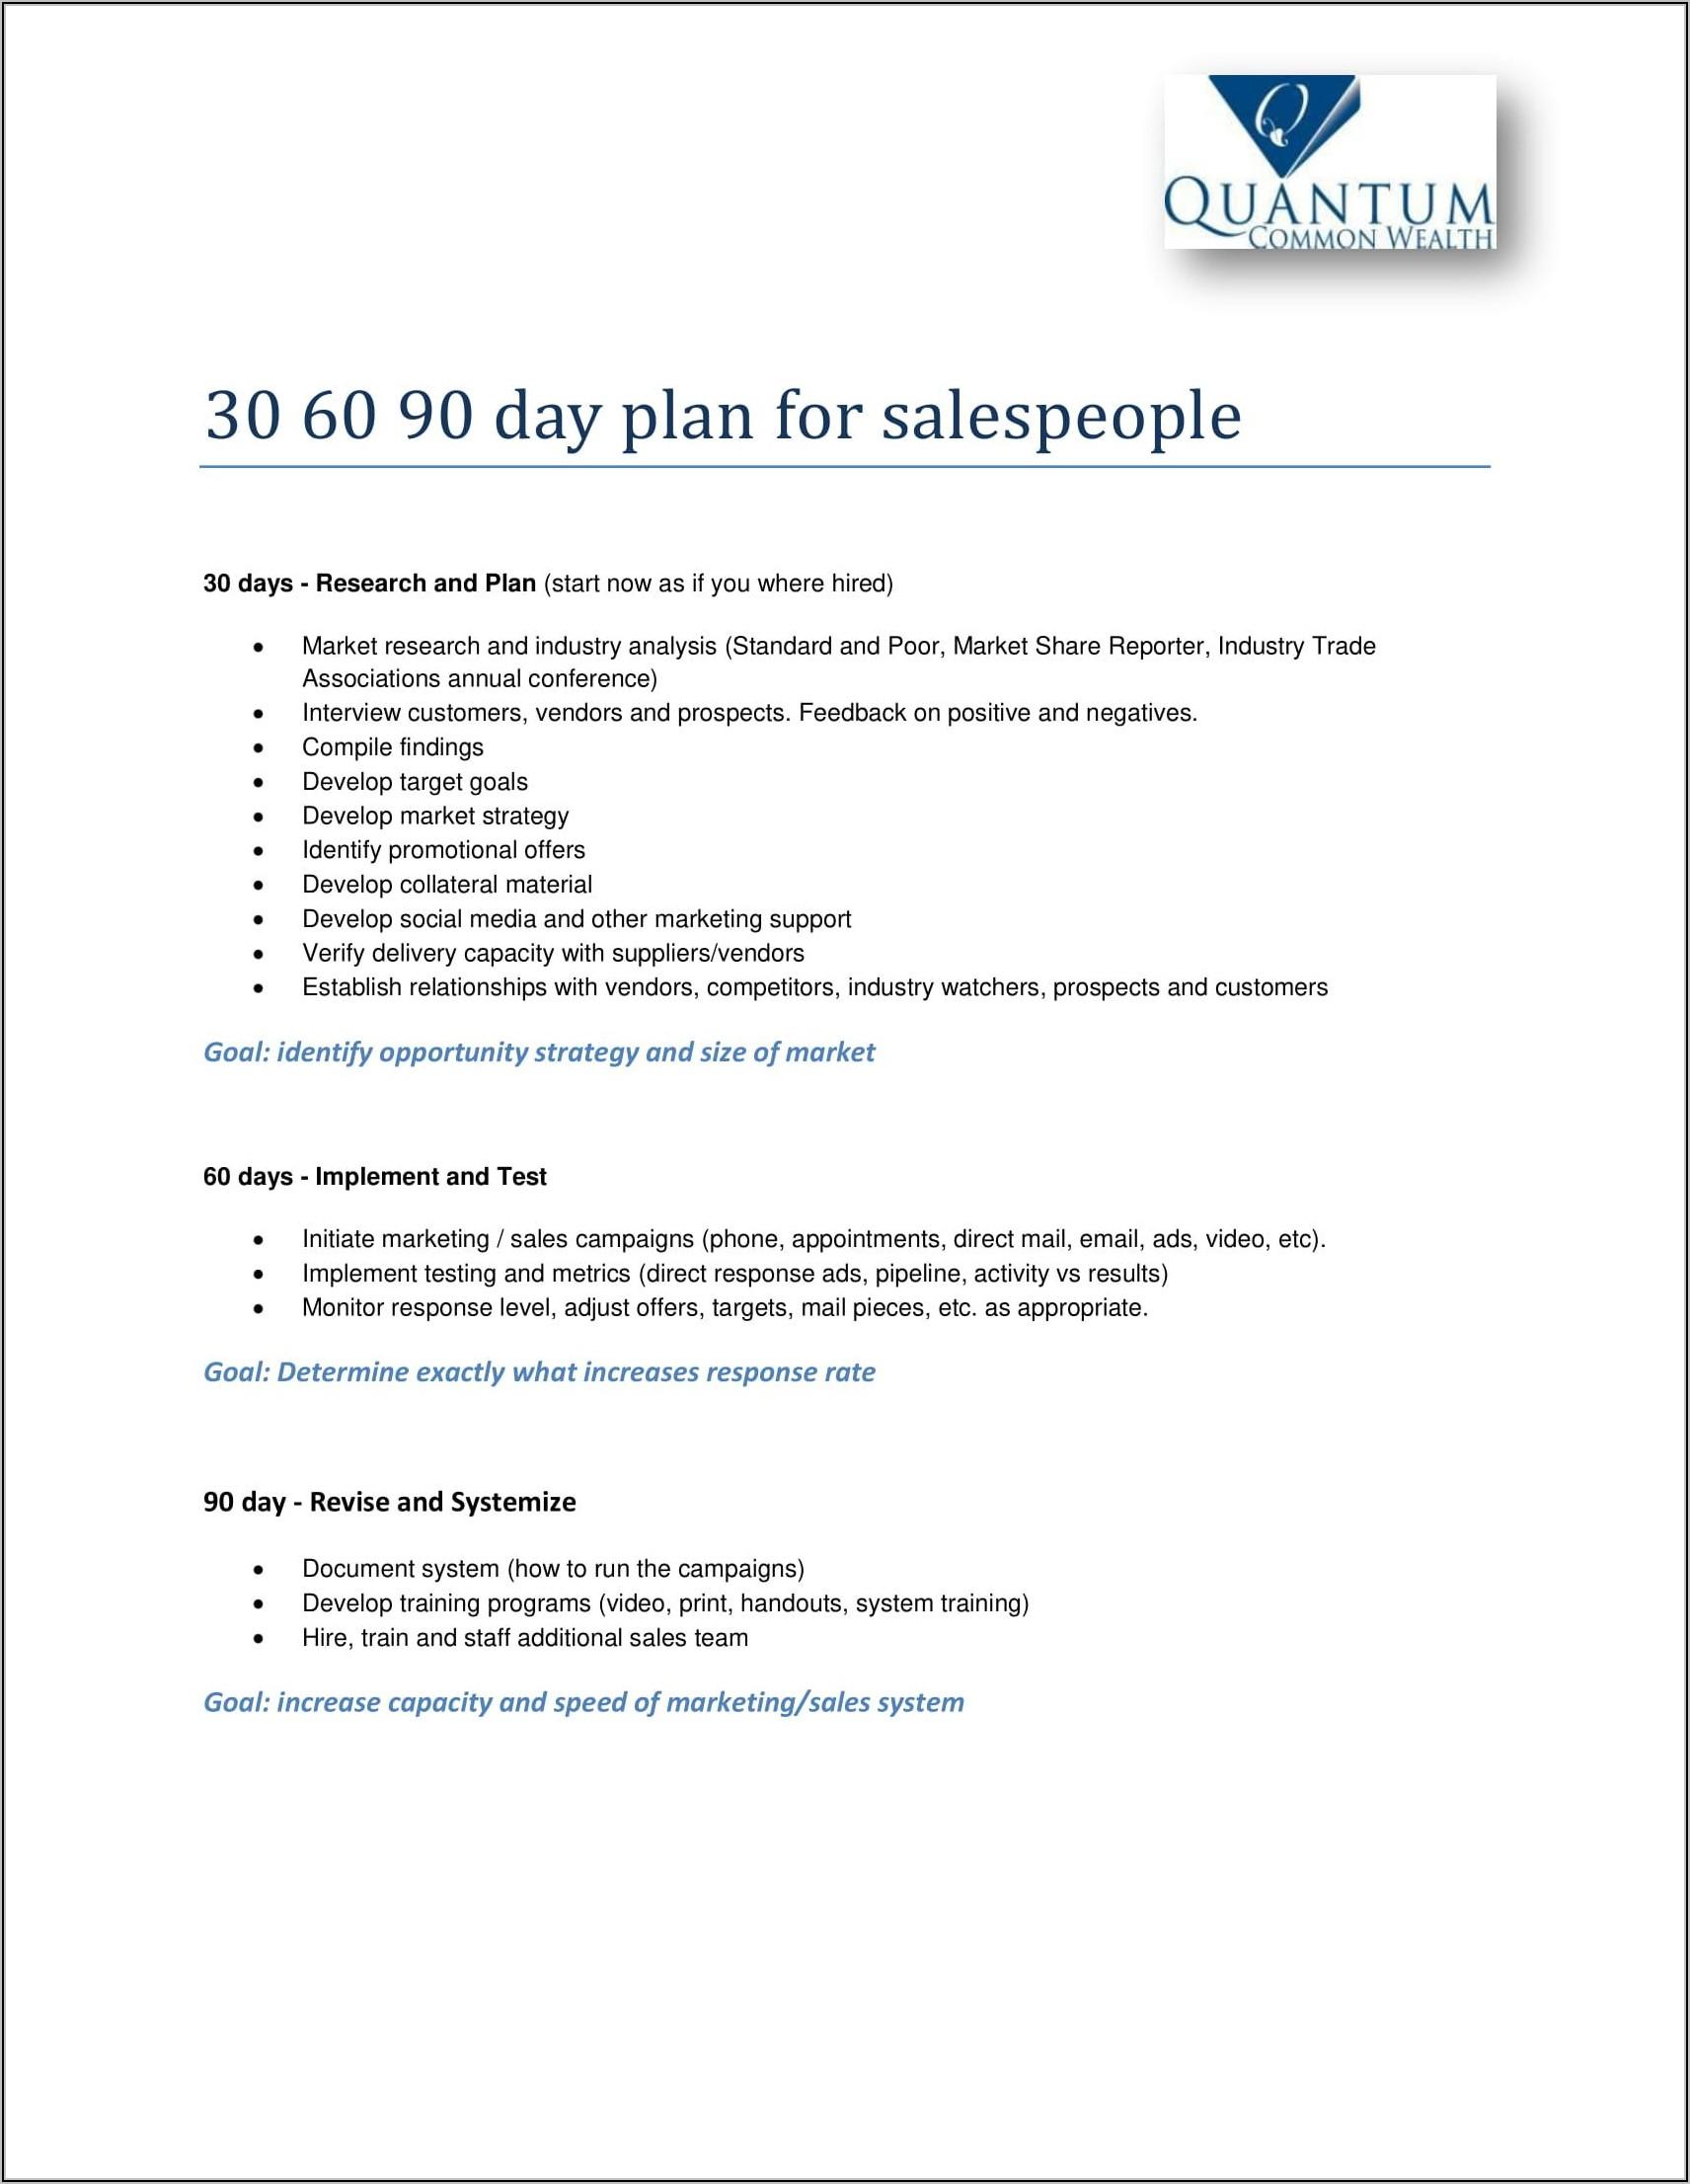 30 60 90 Sales Plan Examples